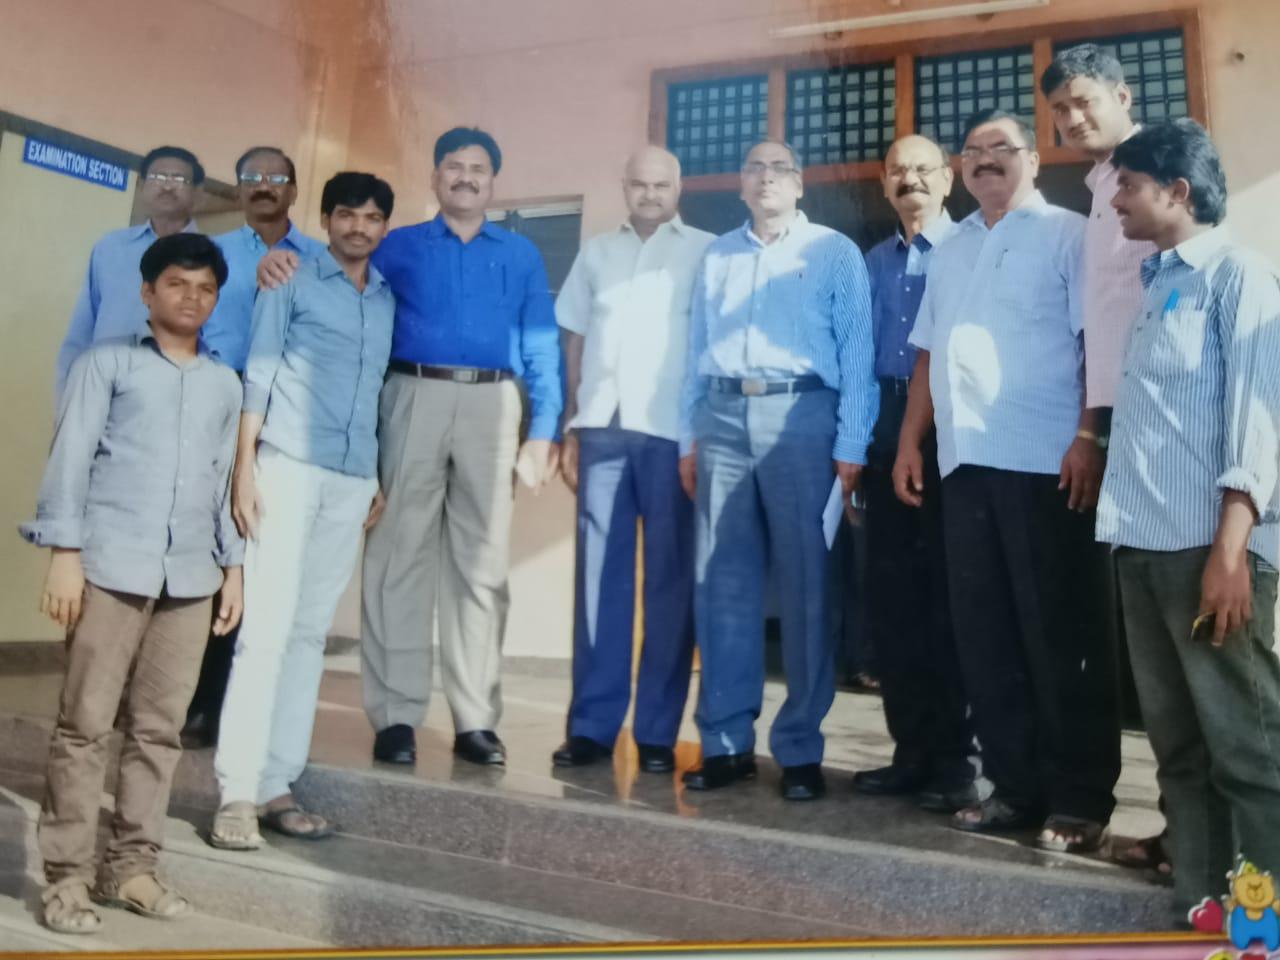 Sappogu Vijaya Baskar, State Convenor of Bhim Army, Andhra Pradesh, M.S.F, M.R.P.S, President of M.S.F University, District President of M.S.F University, Machapuram, Nandanavanam, Kurnool, Yemmiganur, theLeadersPage,